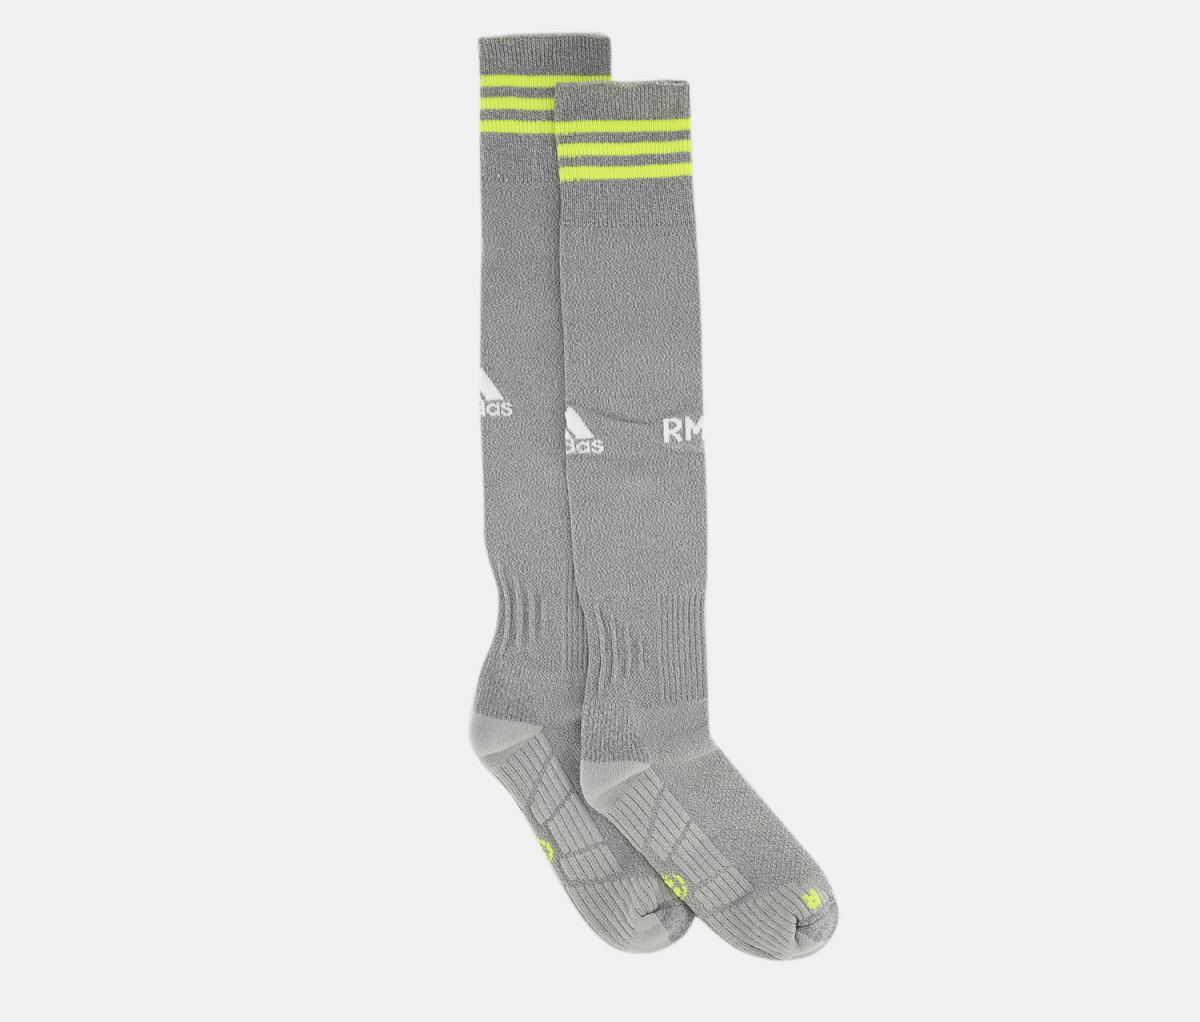 Adidas Men Real Madryt Away Socks  Grey